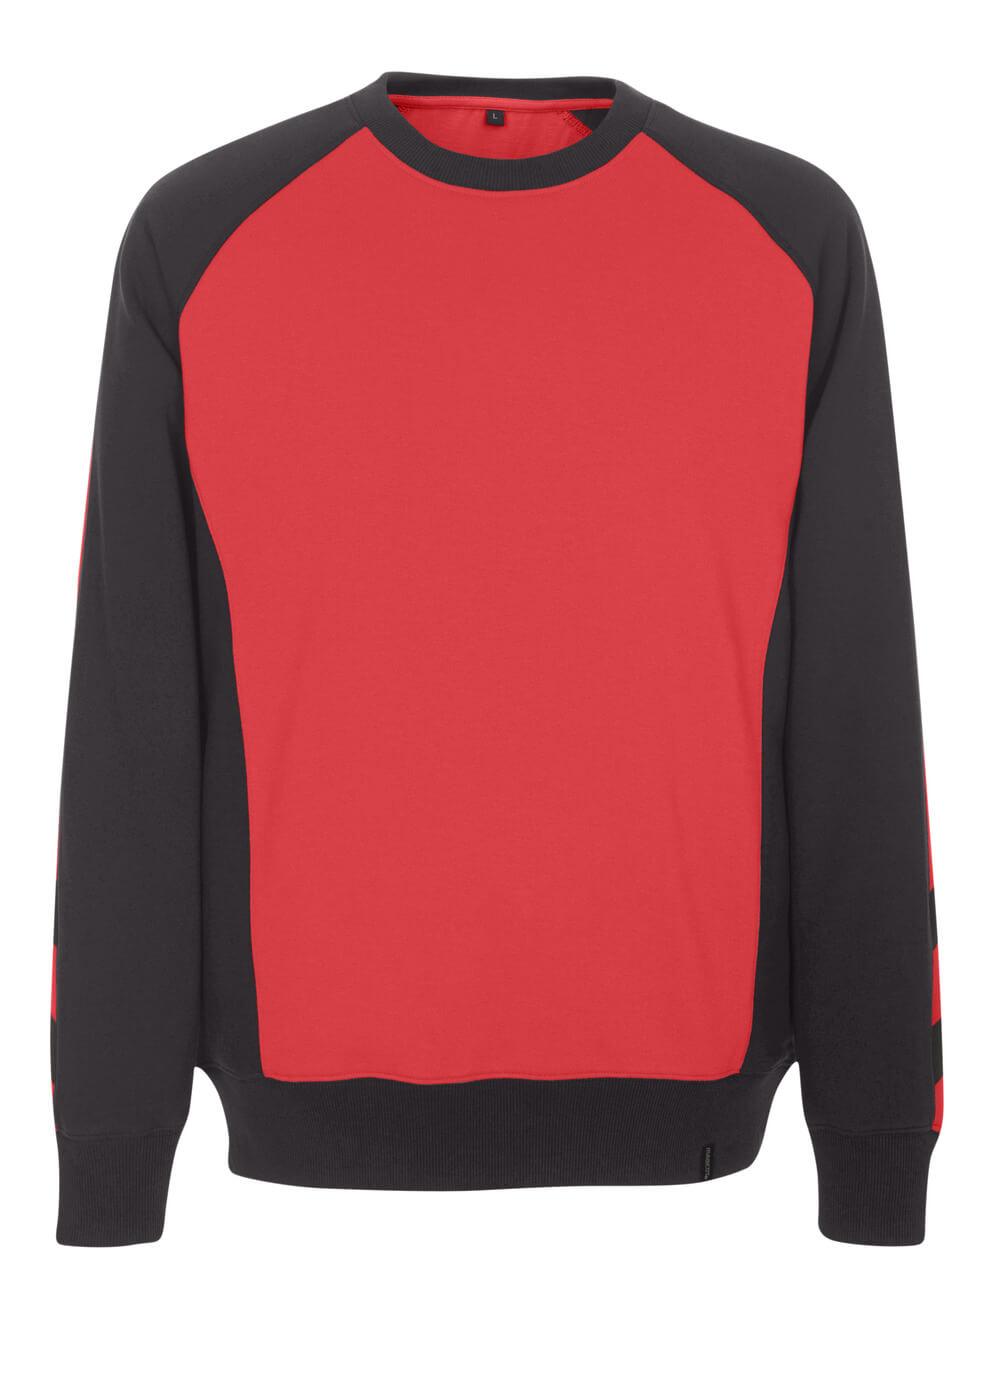 50570-962-0209 Sweatshirt - red/black